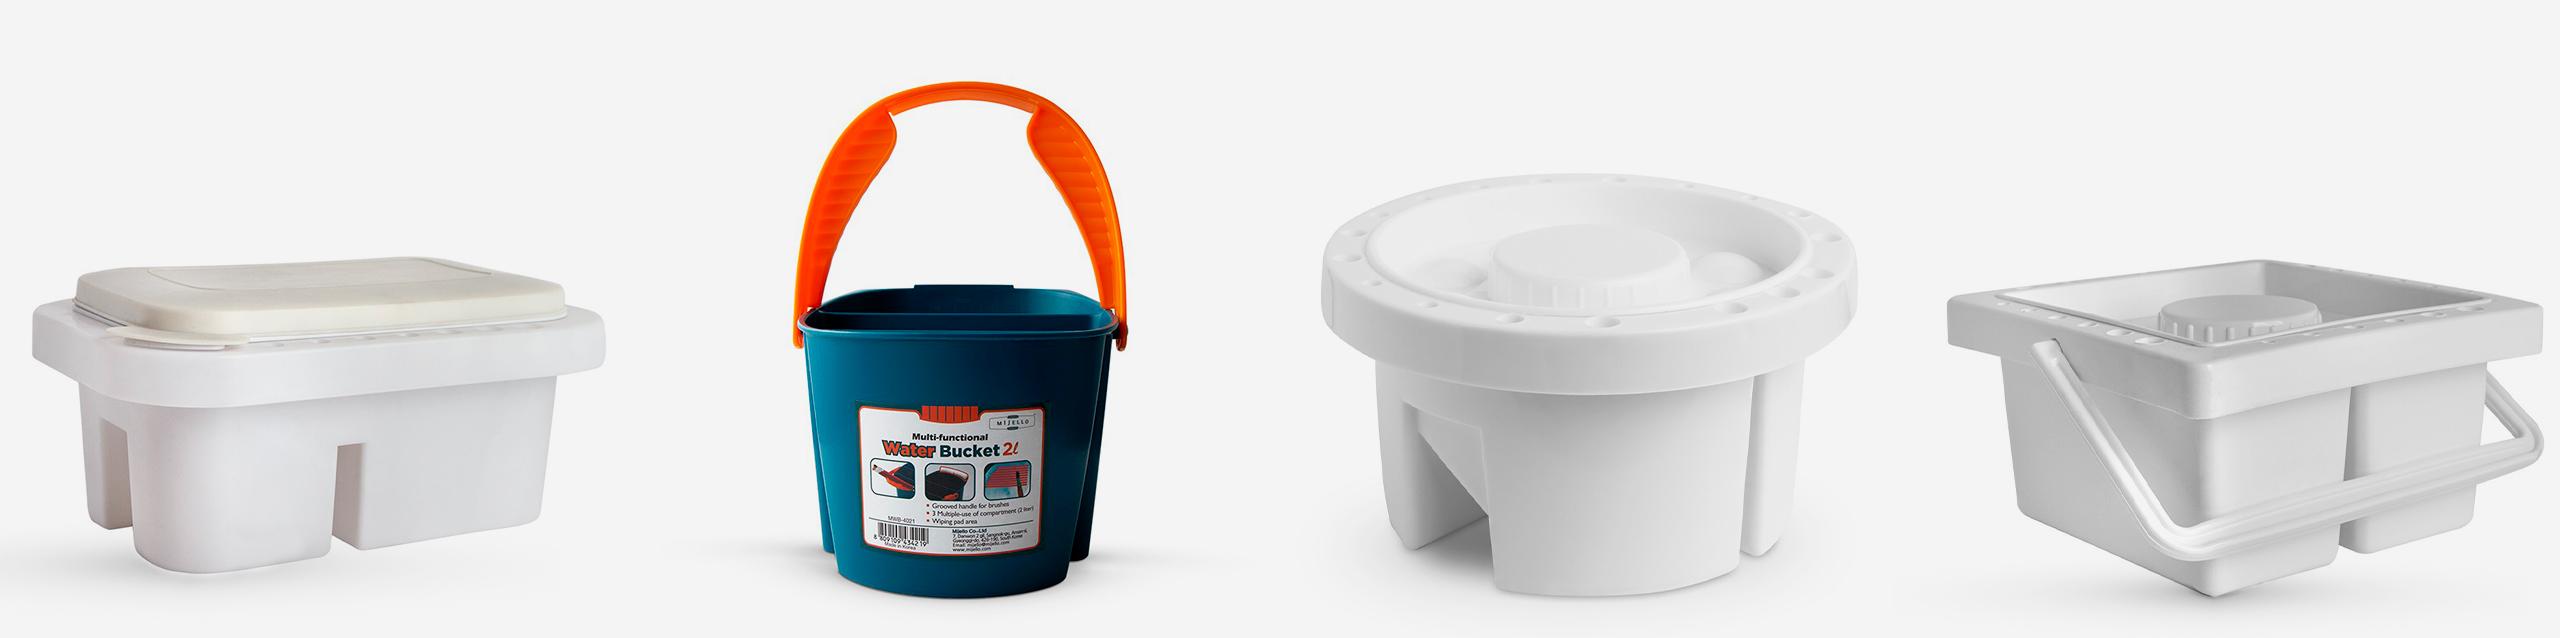 L-R: Plastic Brush Washer with Palette Cover, Mijello Bucket Brush Washer, Studio Essentials Brush pot & Reservoir, Studio Essentials Plastic Brush Washer and Water Pot